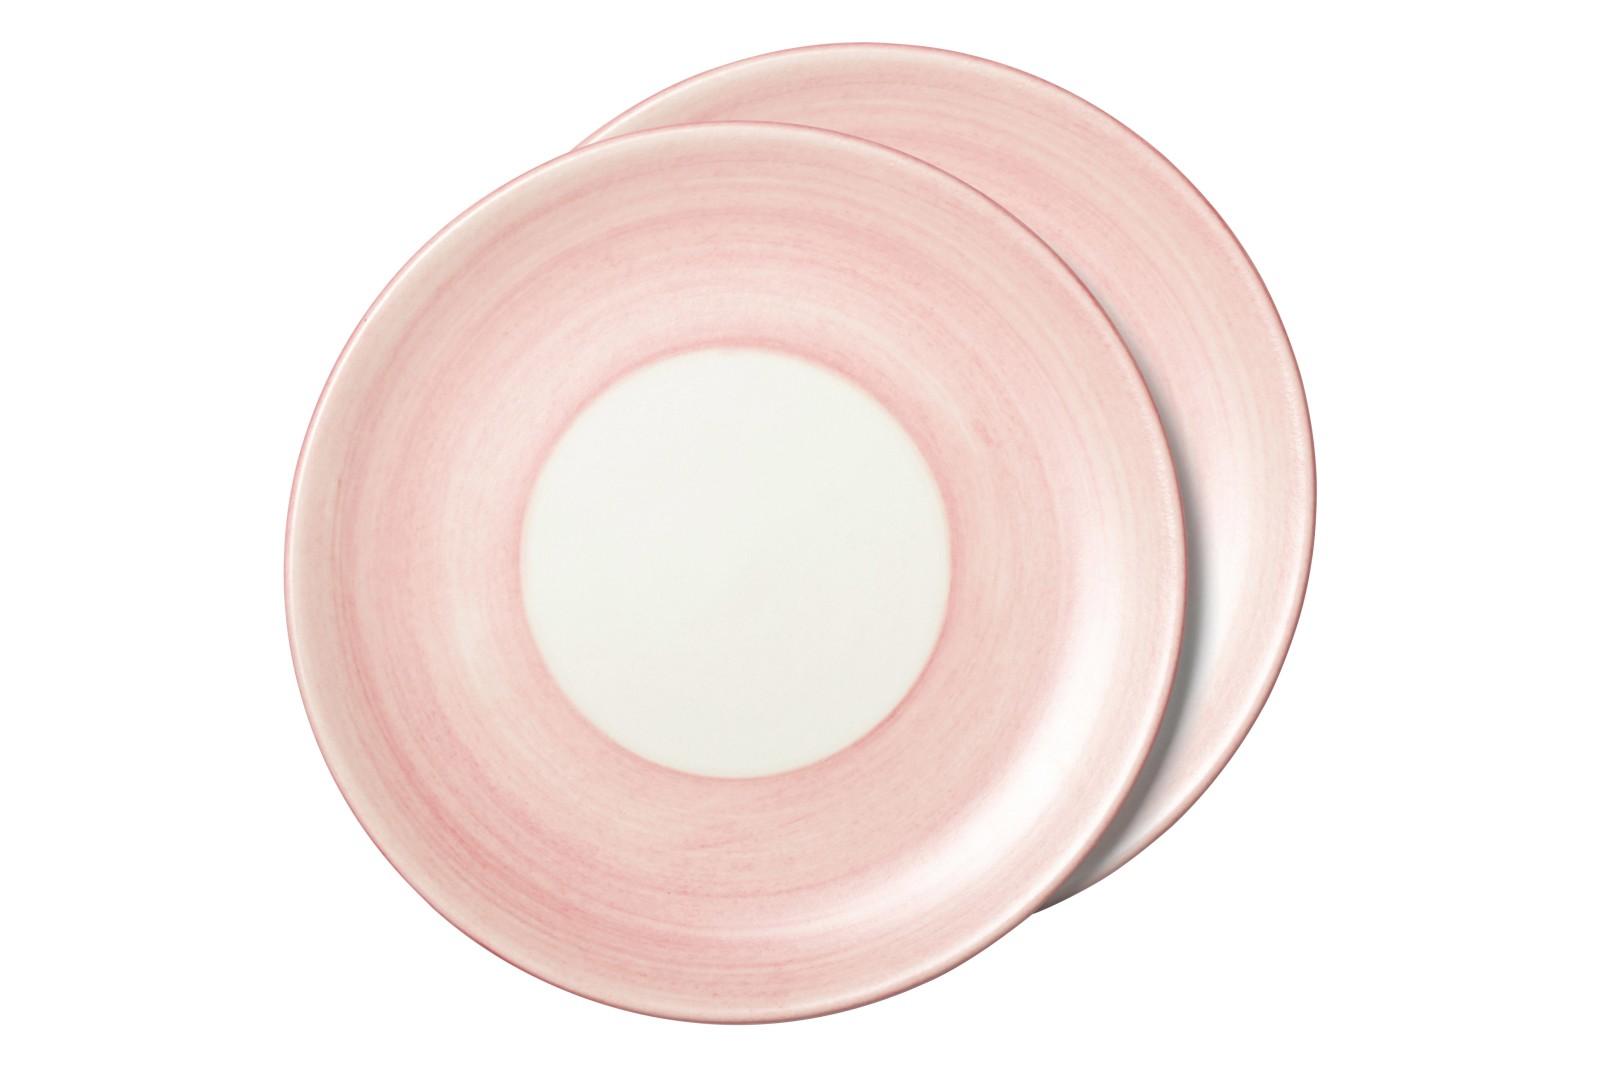 Turnì Plates Pink, Small